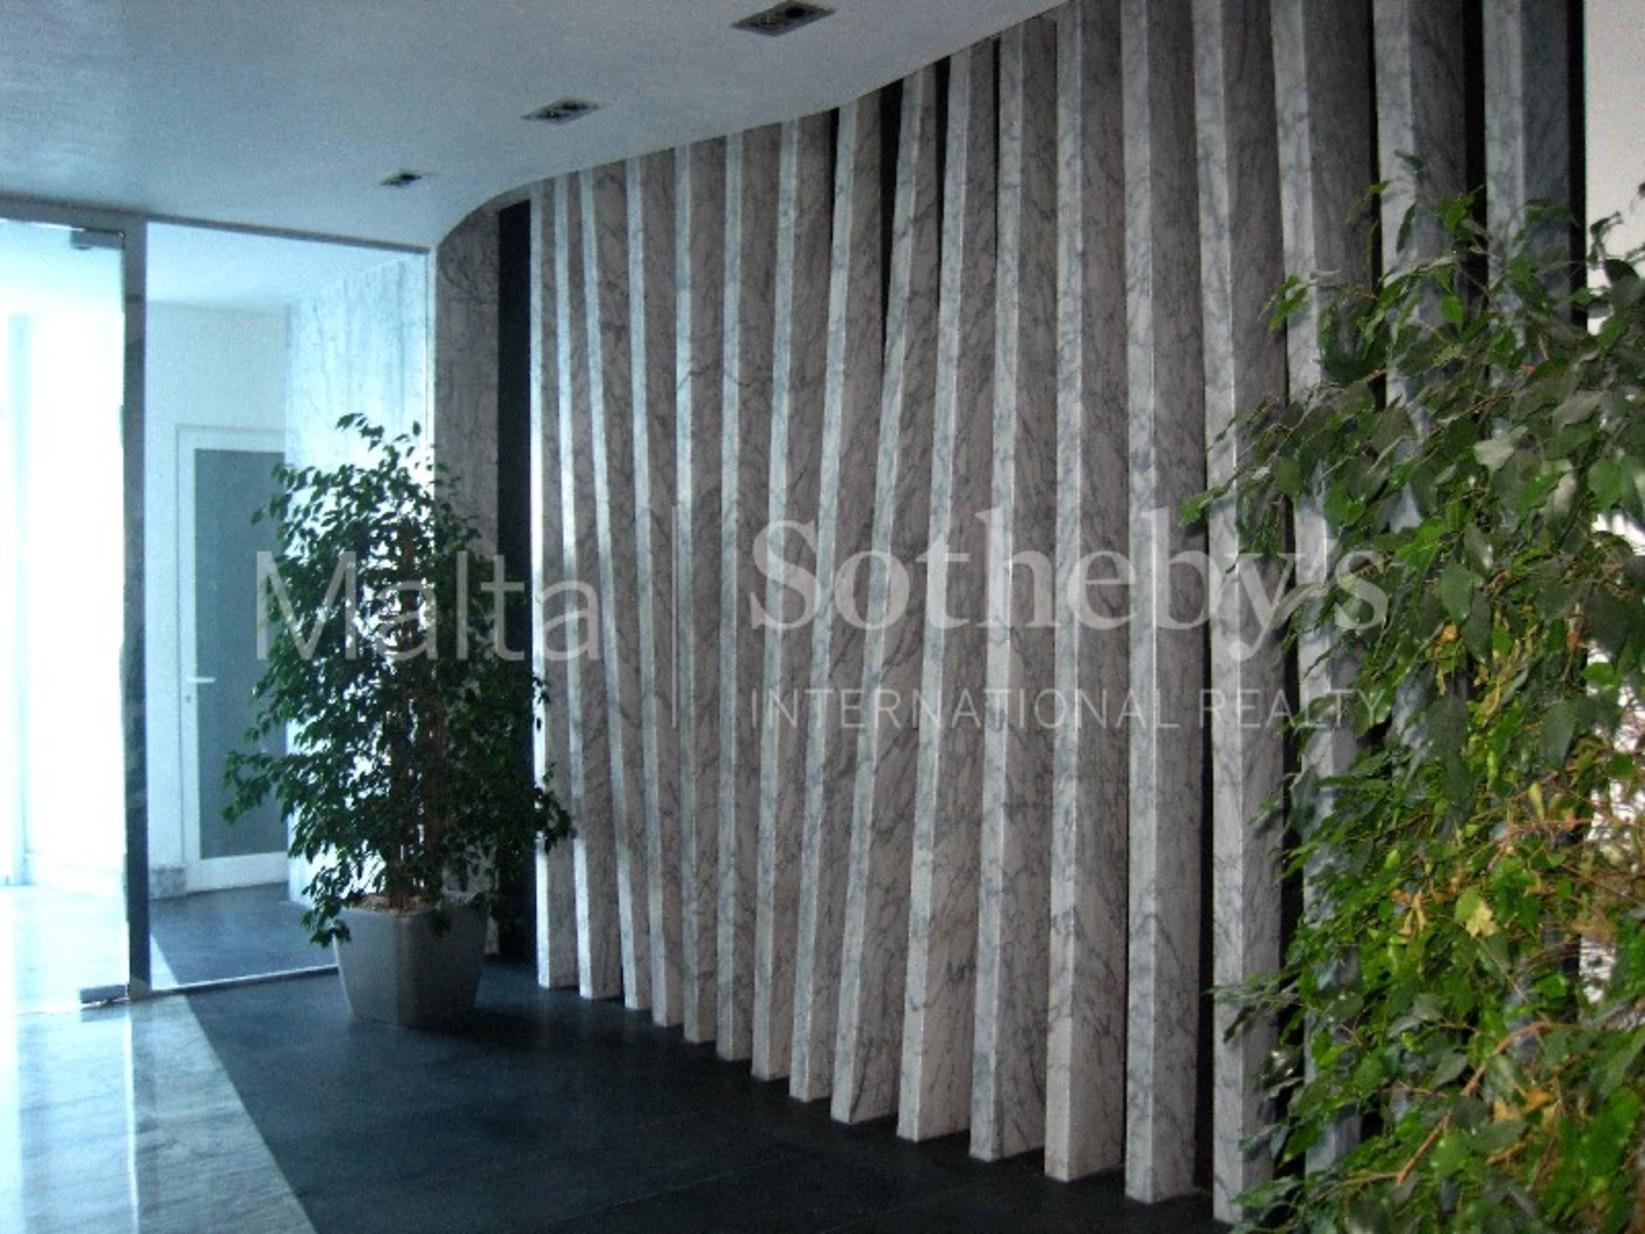 4 bed Apartment For Rent in Sliema, Sliema - thumb 11